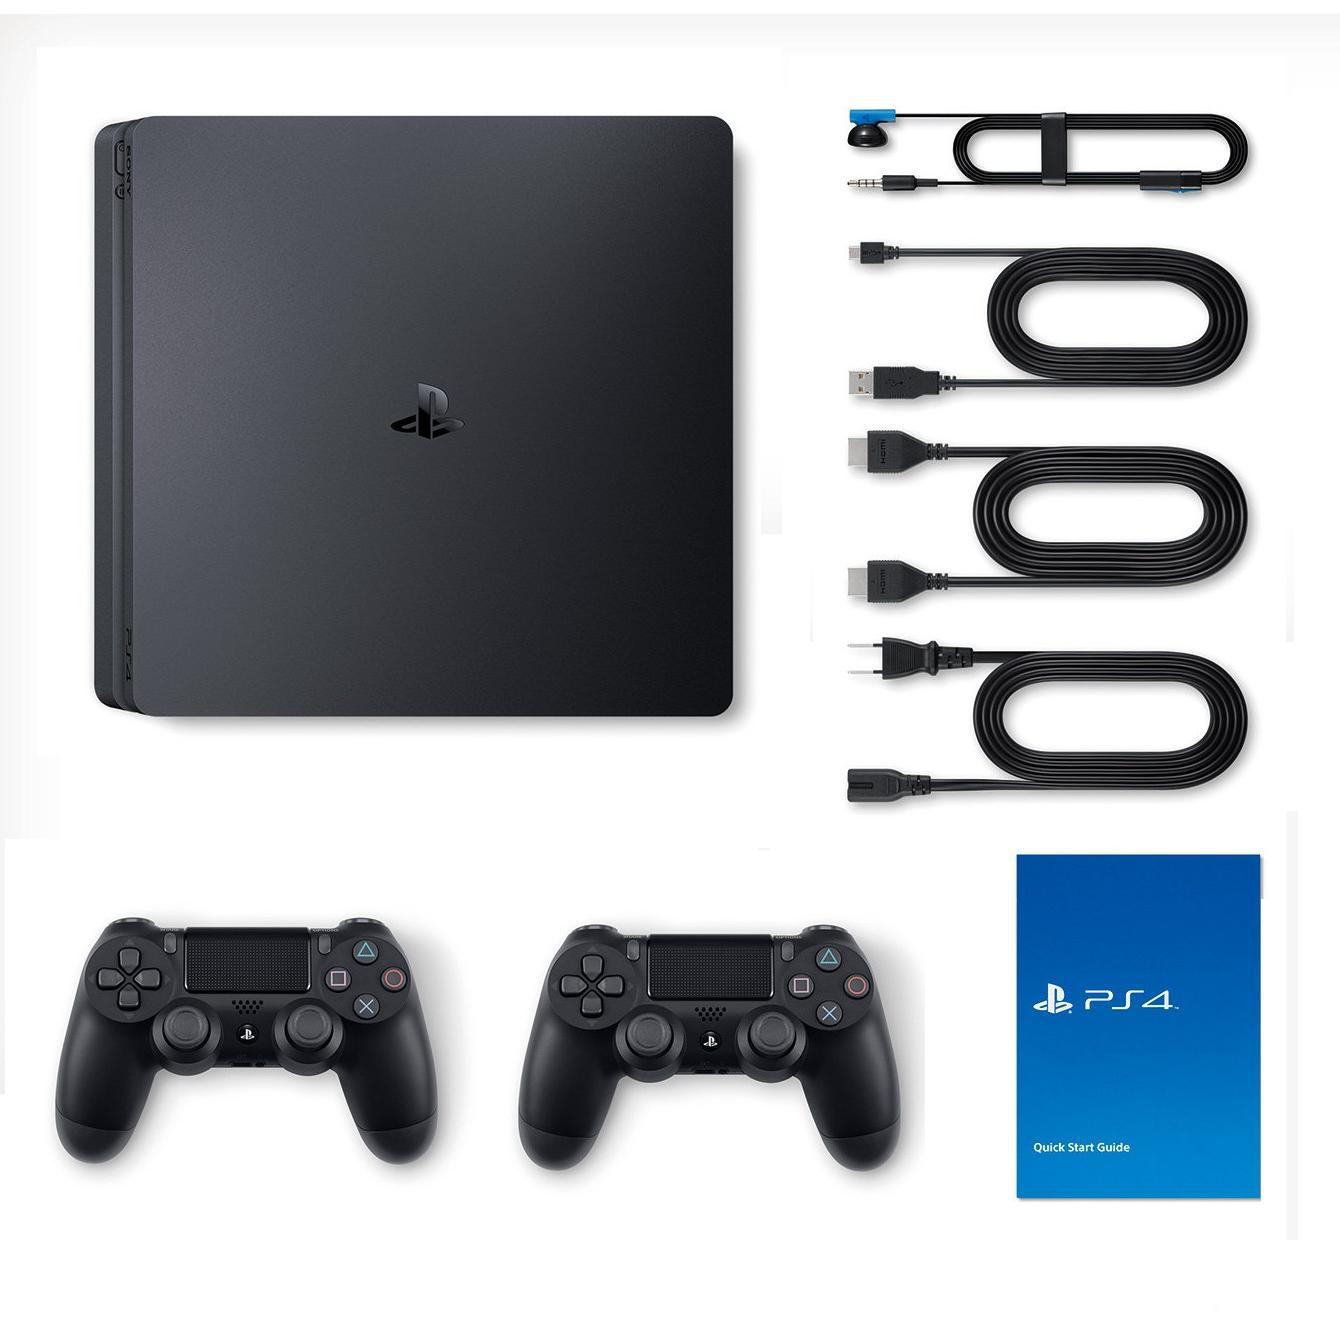 Sony Ps4 Slim Playstation Slim 1tb End 4 27 2020 3 26 Pm